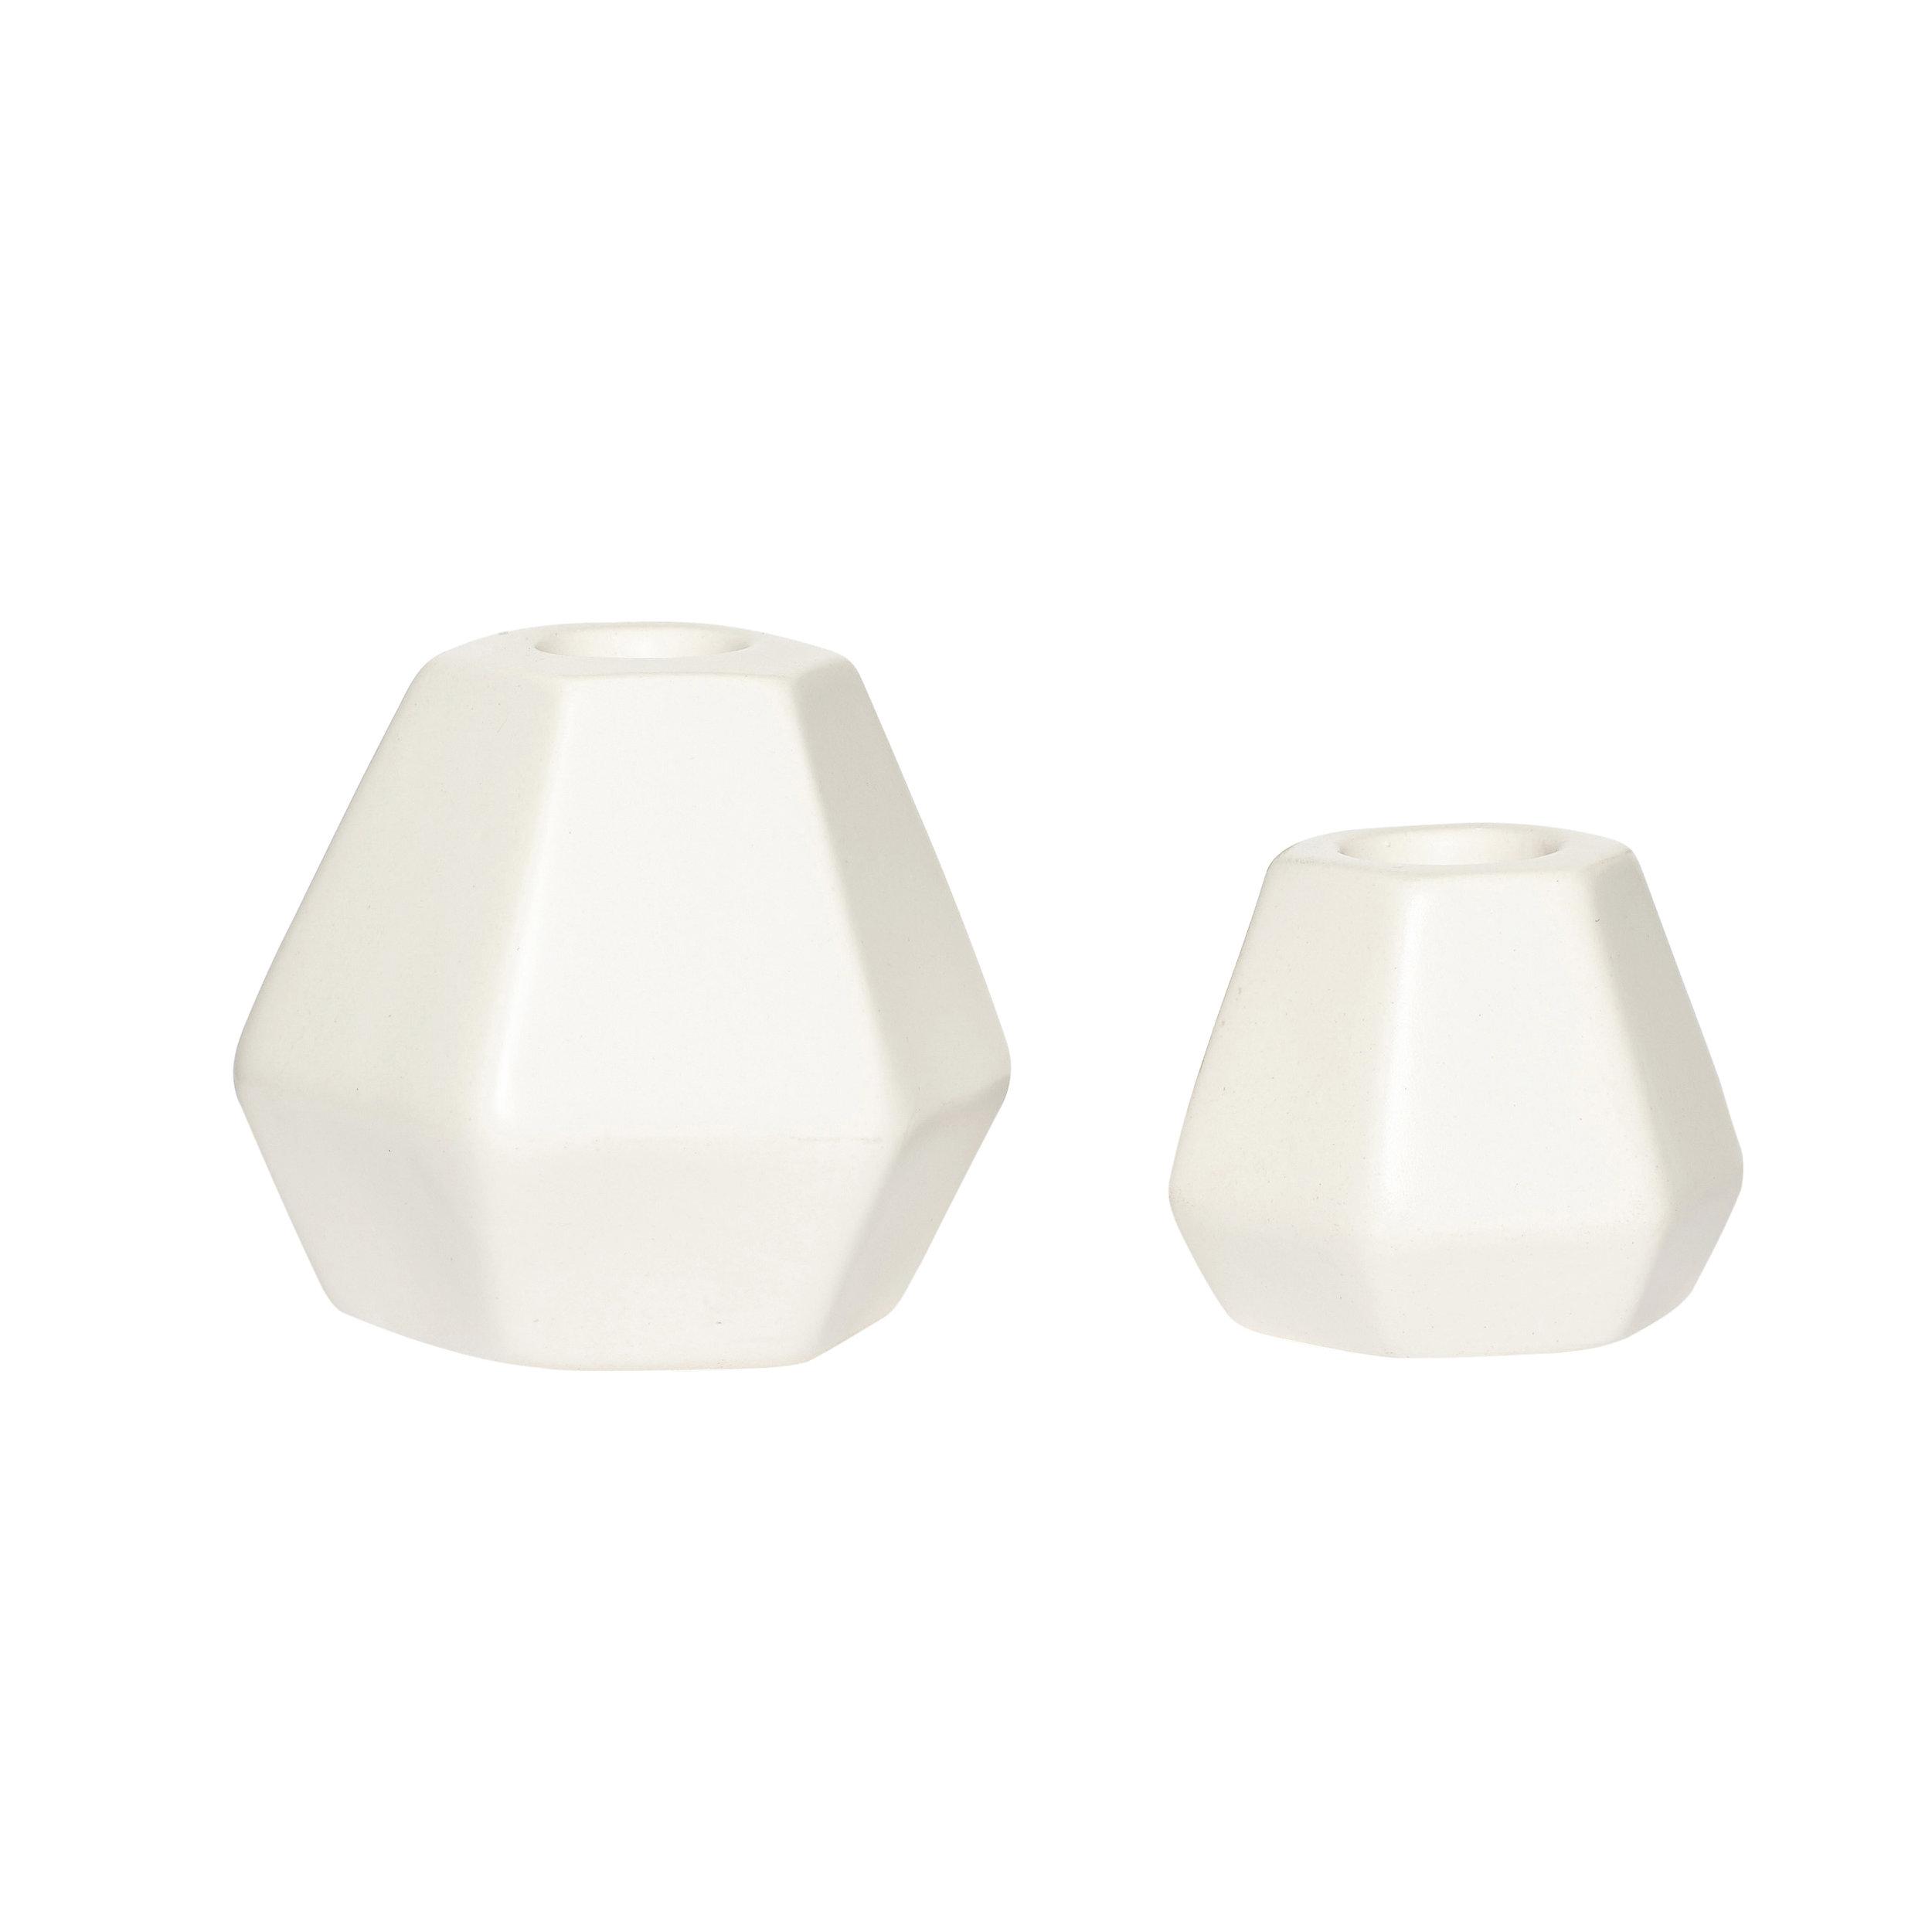 #039 White Marble Candle Stick Set    6cmxH5cm, 8cmxH8cm Hire Price - £2.50 Minimum Order 10 per set Current Stock Available 36 per set